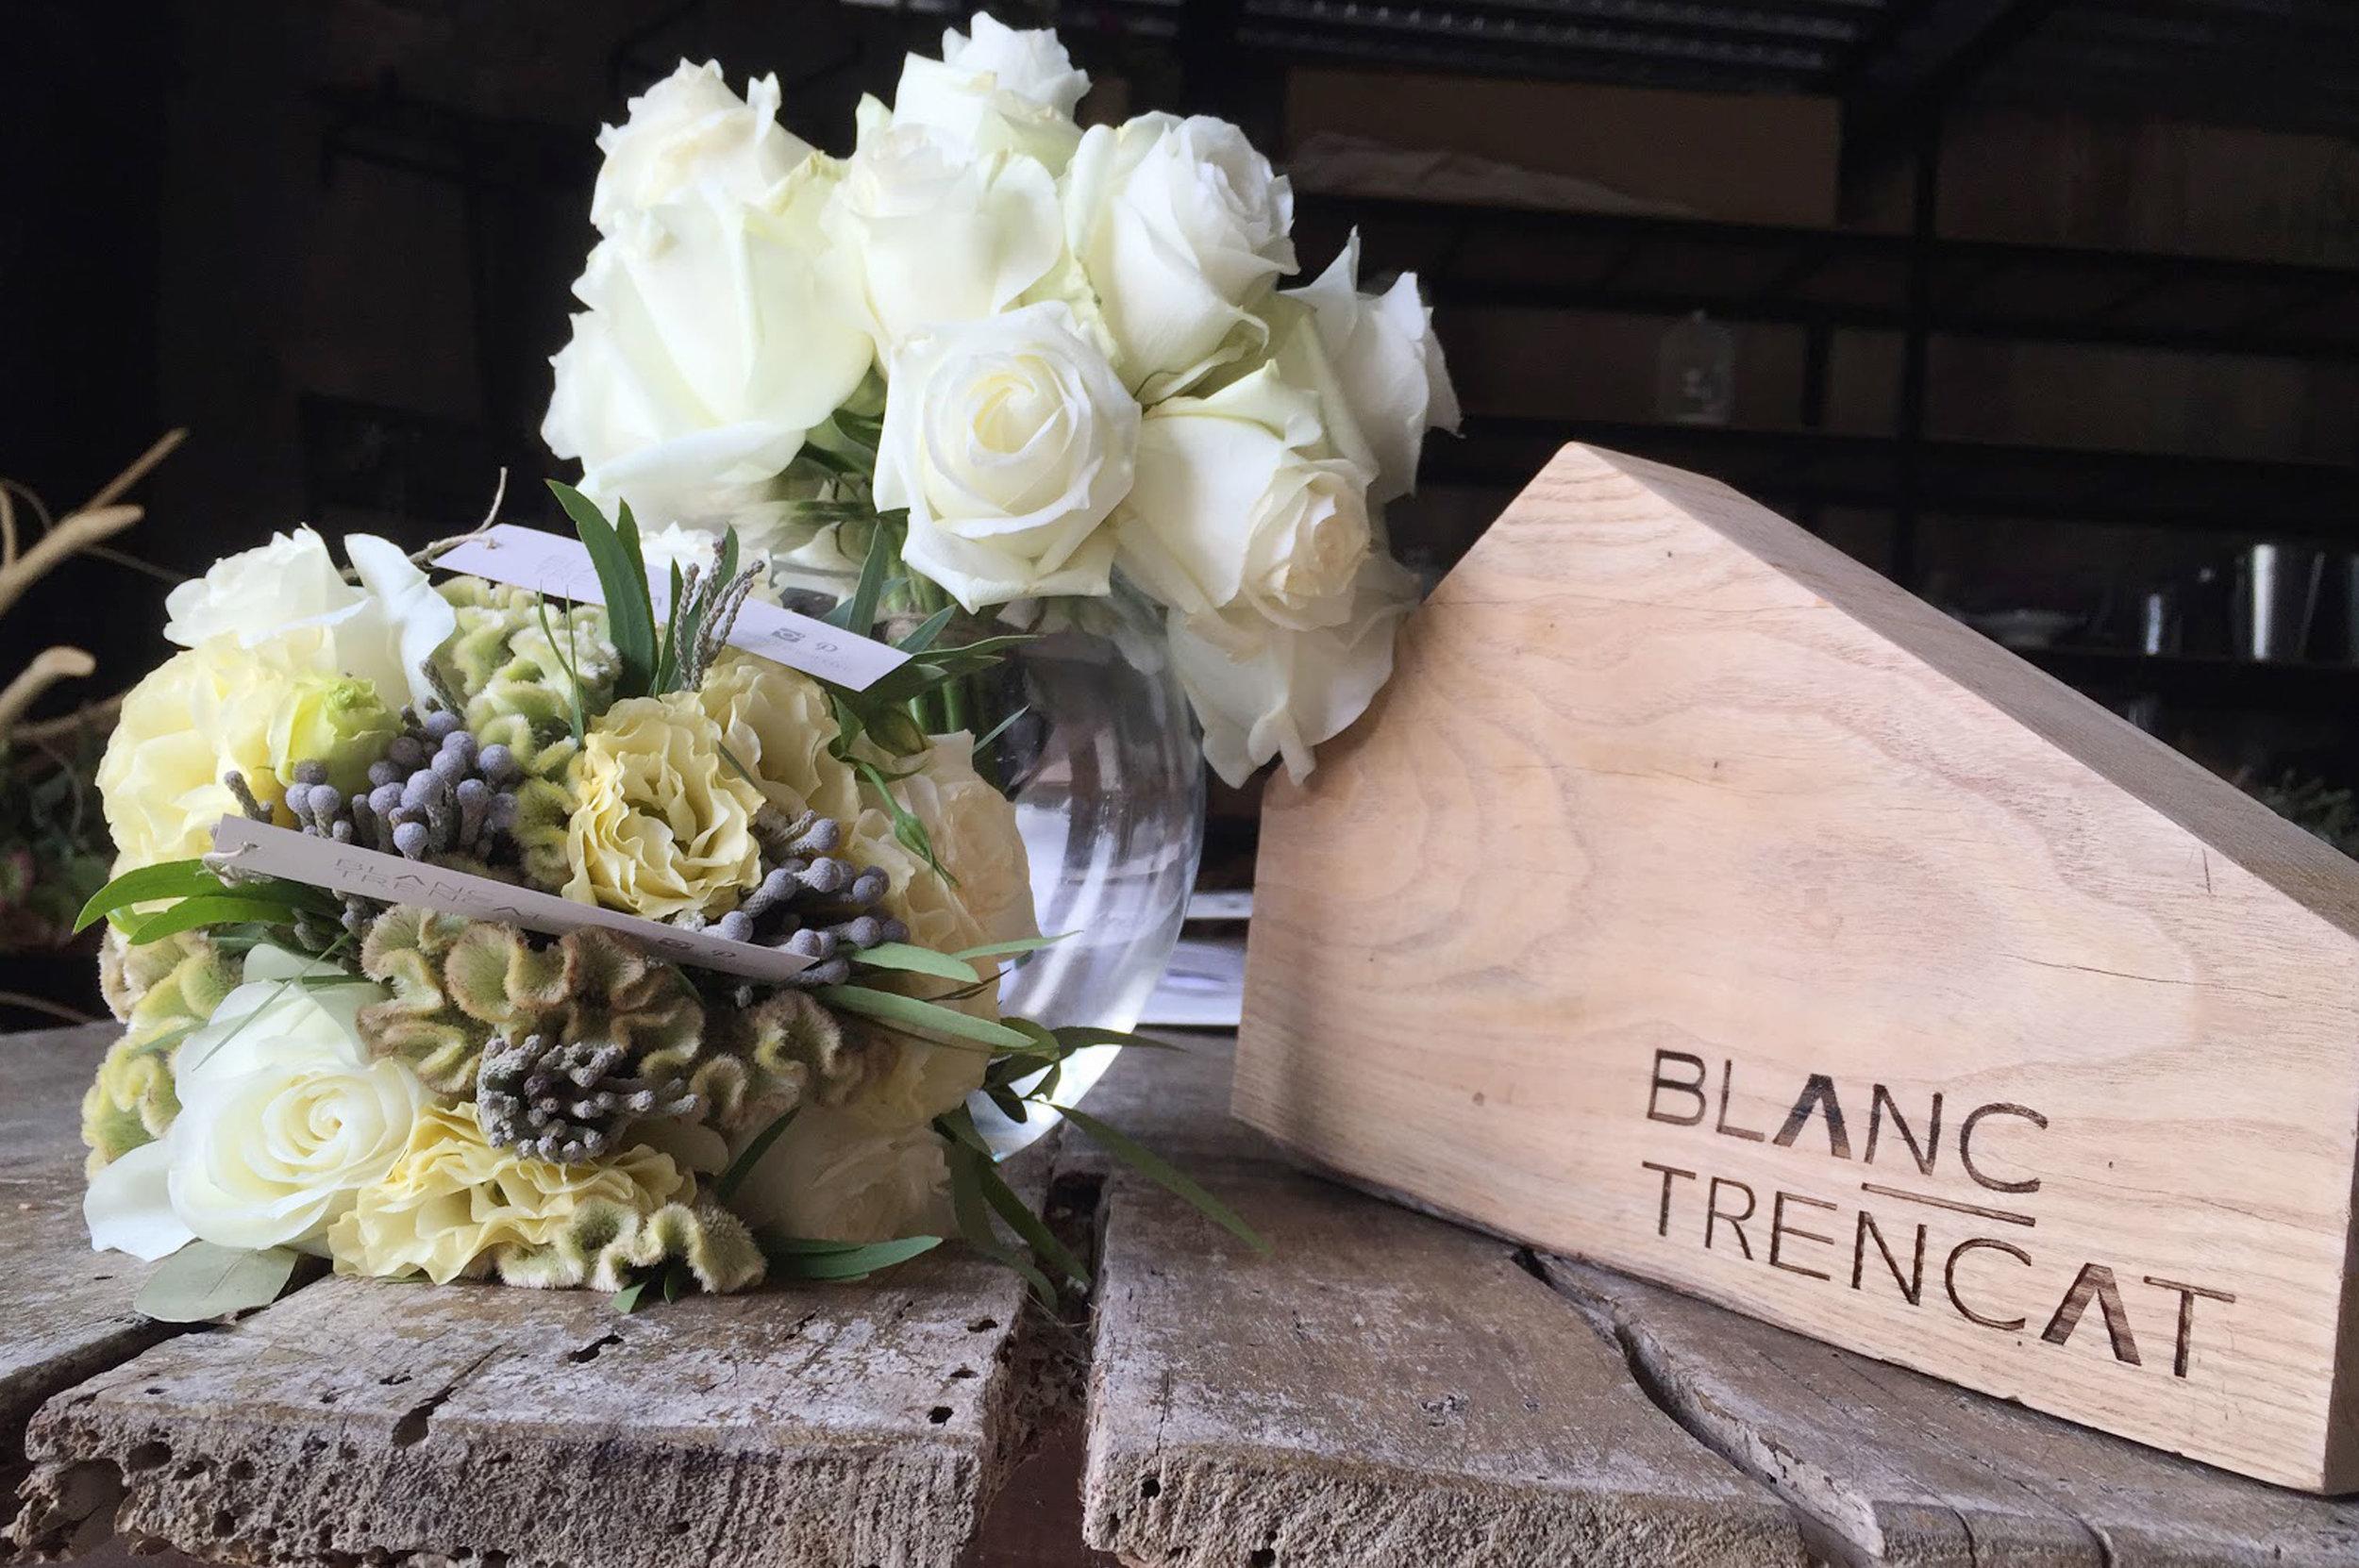 decoracion-boda-blanctrencat-22.jpg